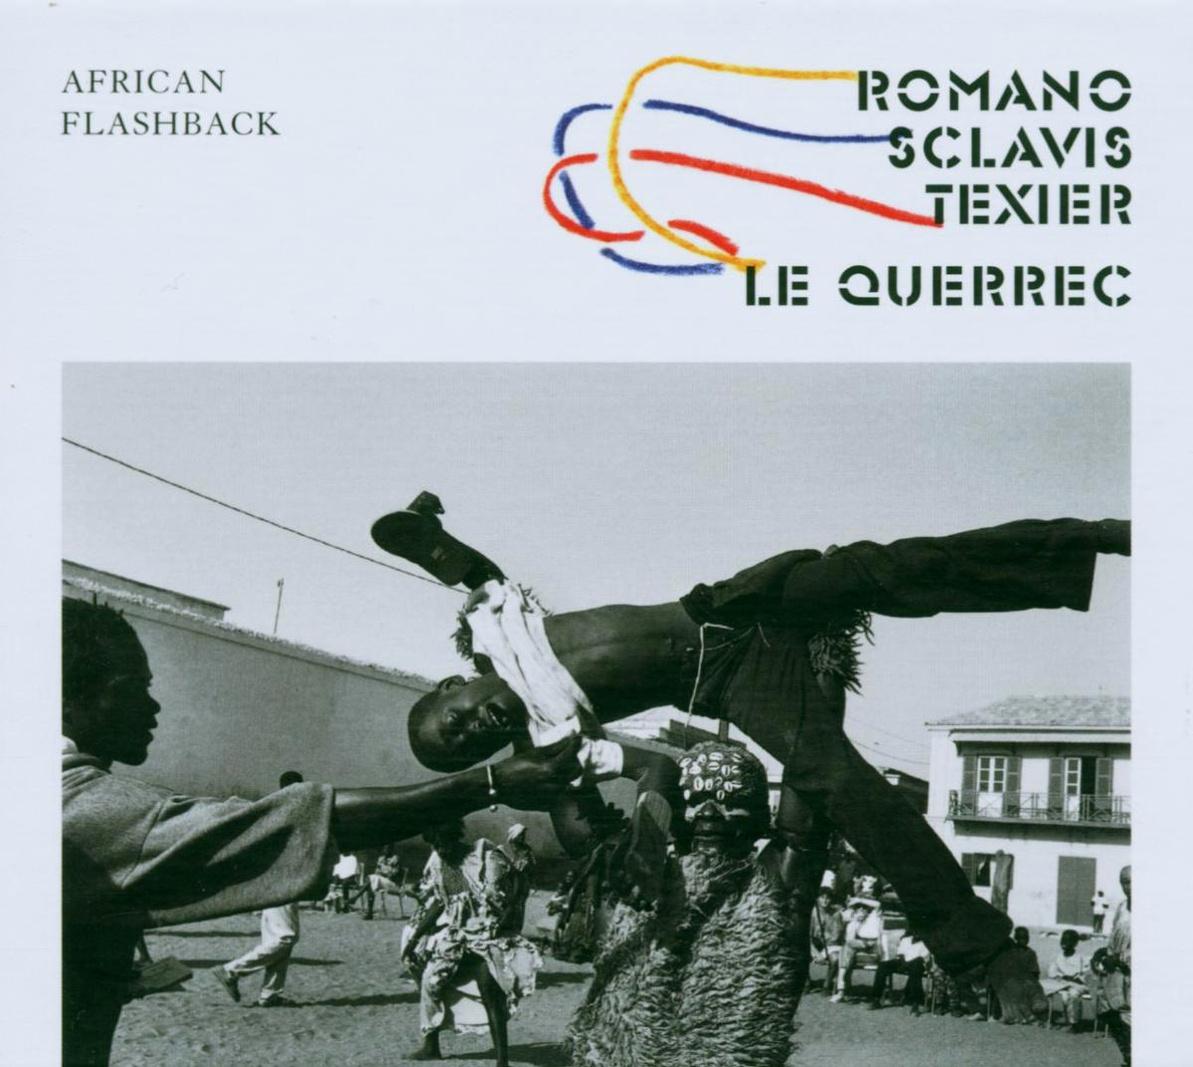 Sclavis,Texier Romano - African Flashback